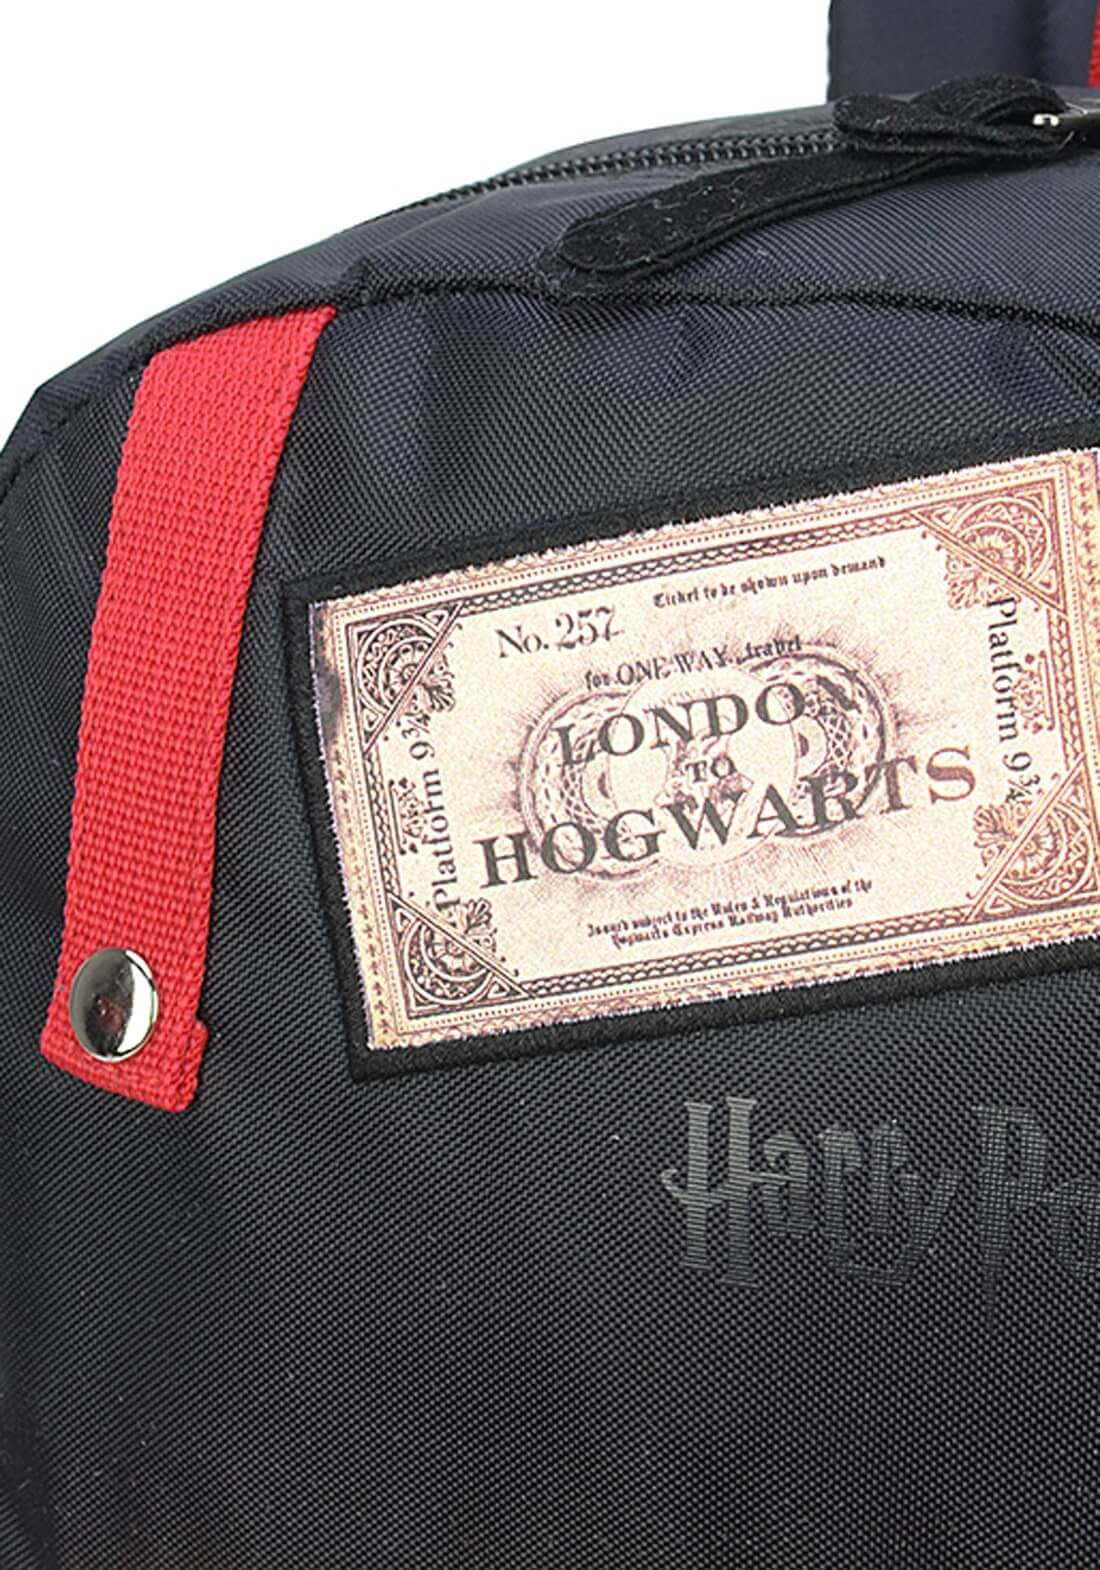 Mochila Harry Potter Carta Bilhete Plataforma 9 3/4 Original